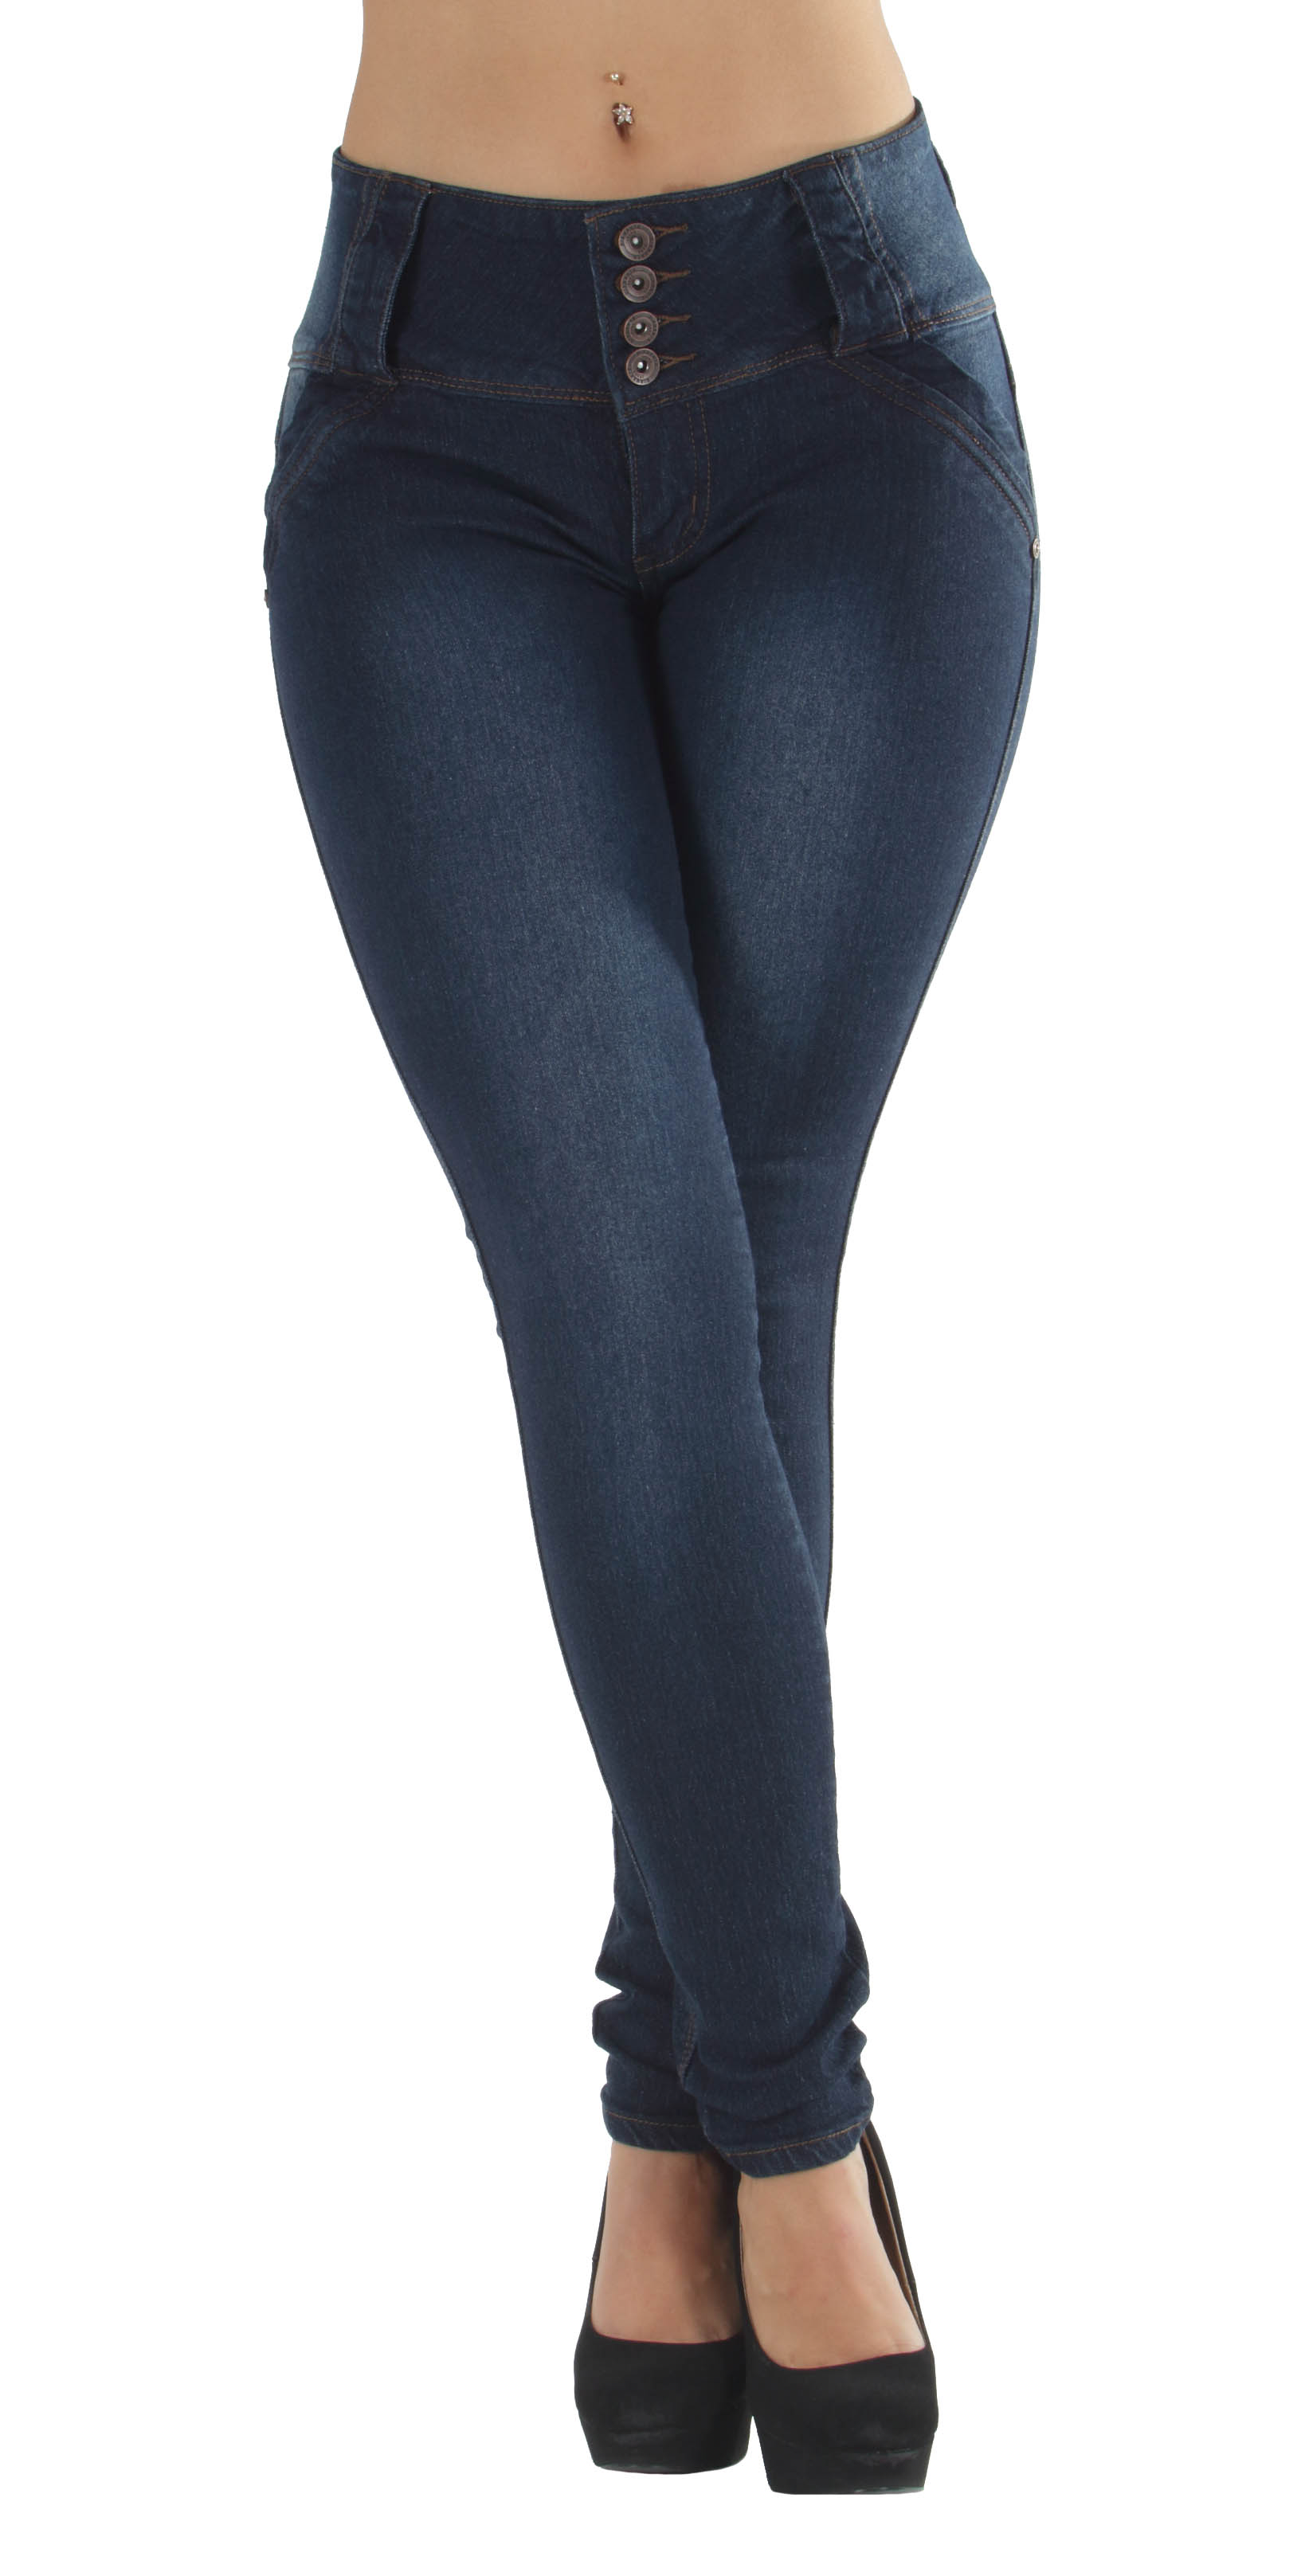 Mid Waist Skinny Jeans Levanta Cola Colombian Design N3558 Butt Lift